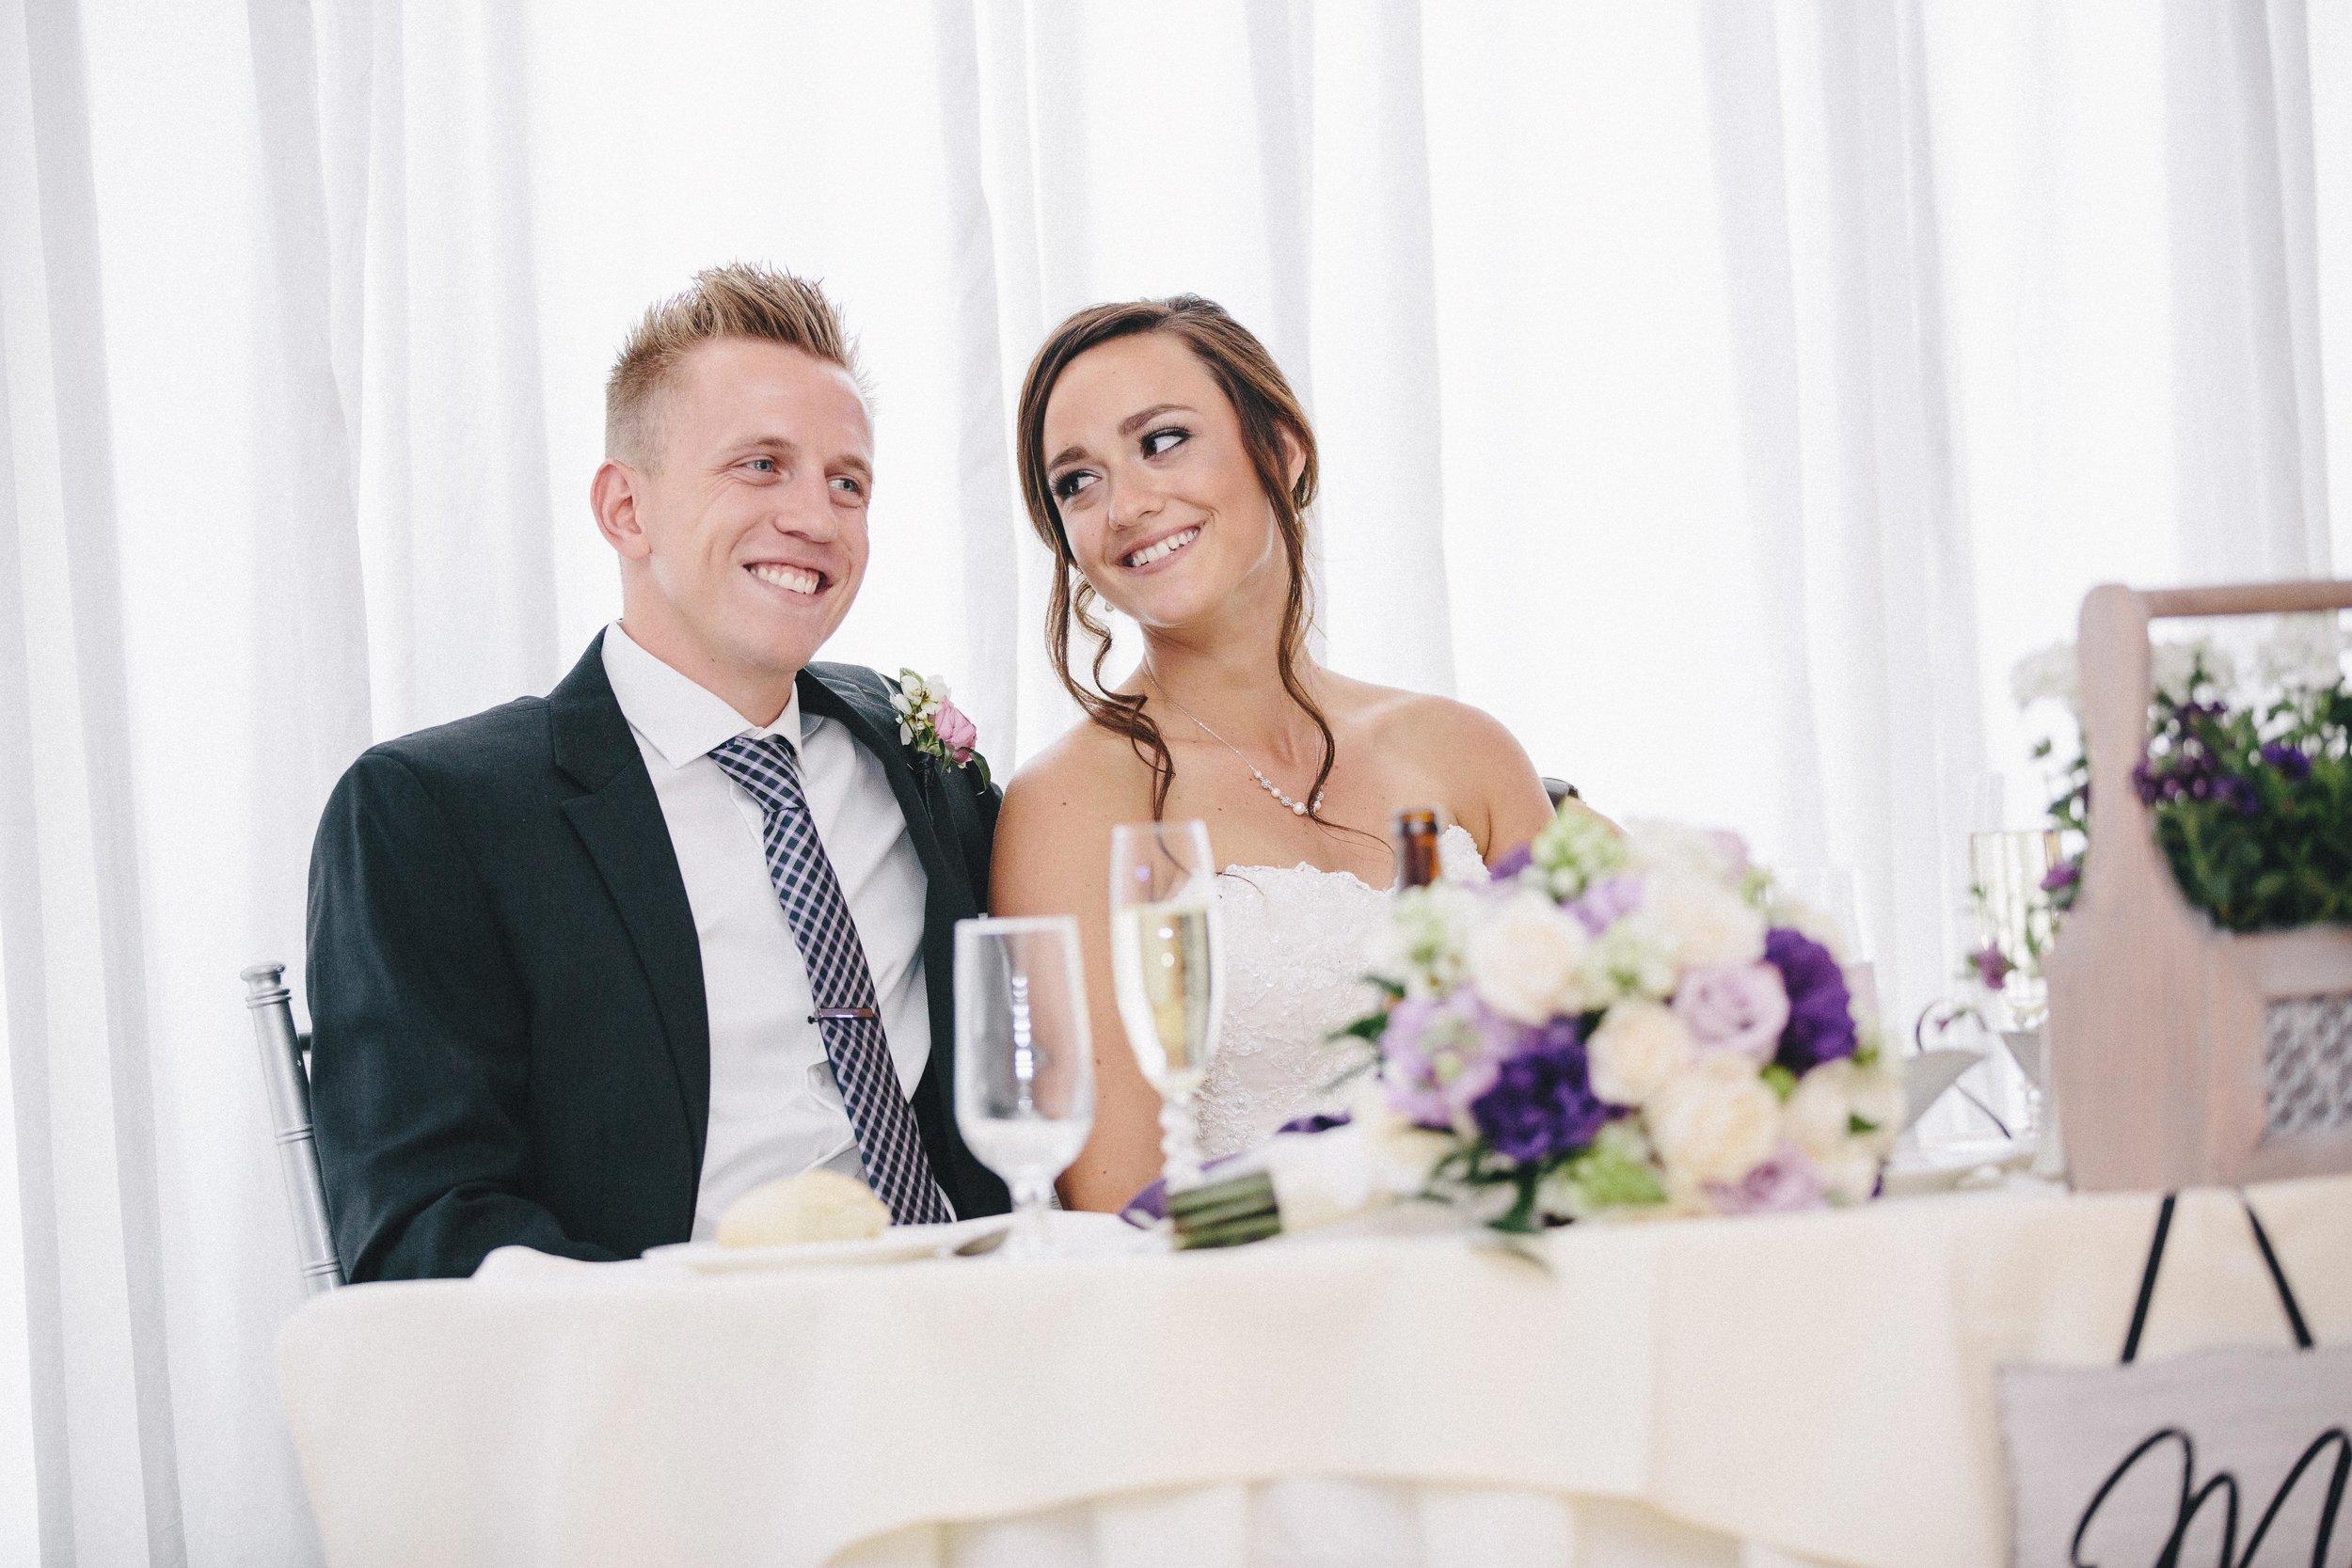 MP_16.06.12_Zach-&-Katlyn-Wedding-3698.jpg